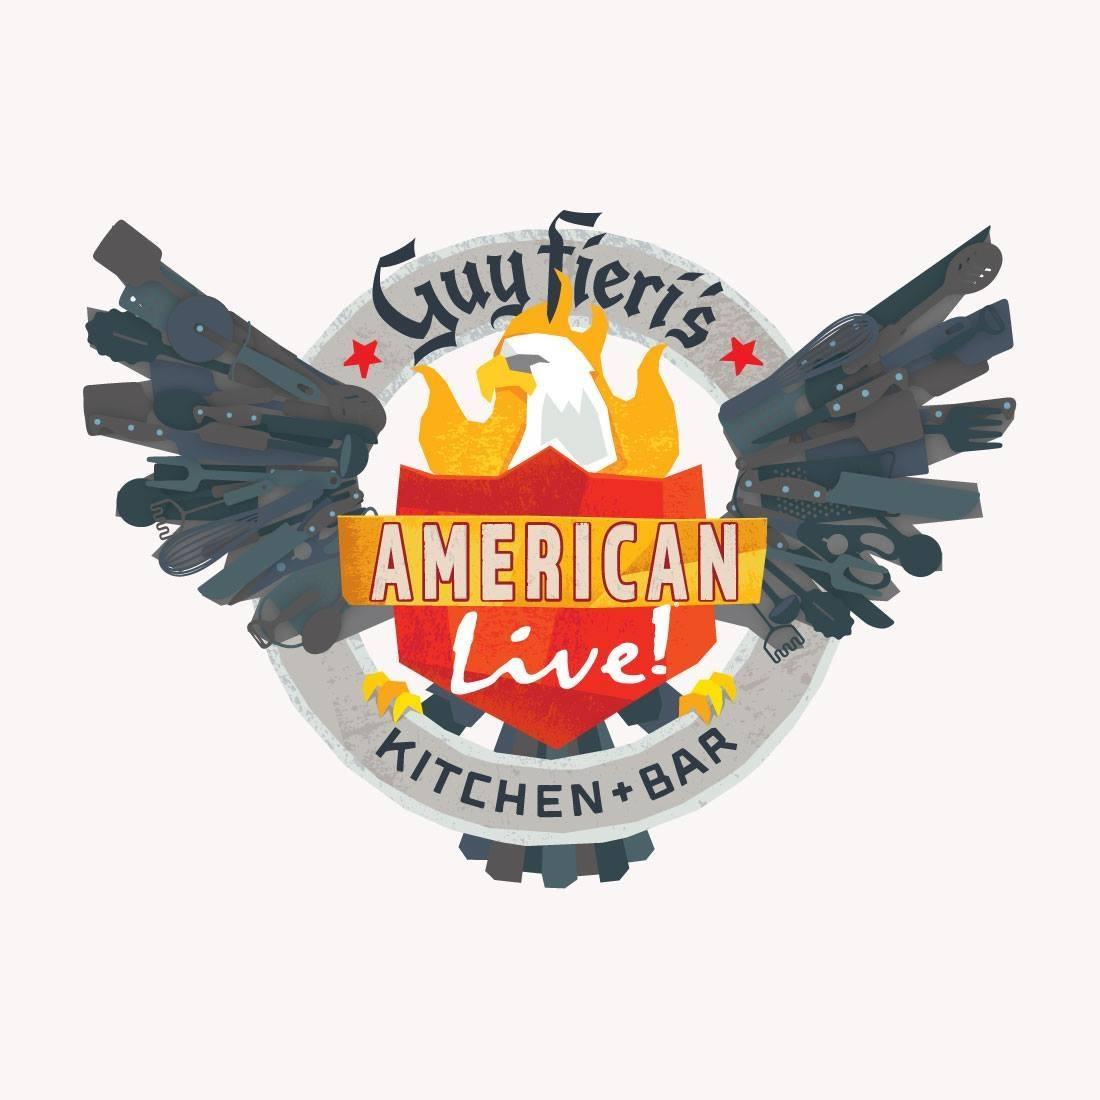 Guy Fieri's American Kitchen + Bar Logo